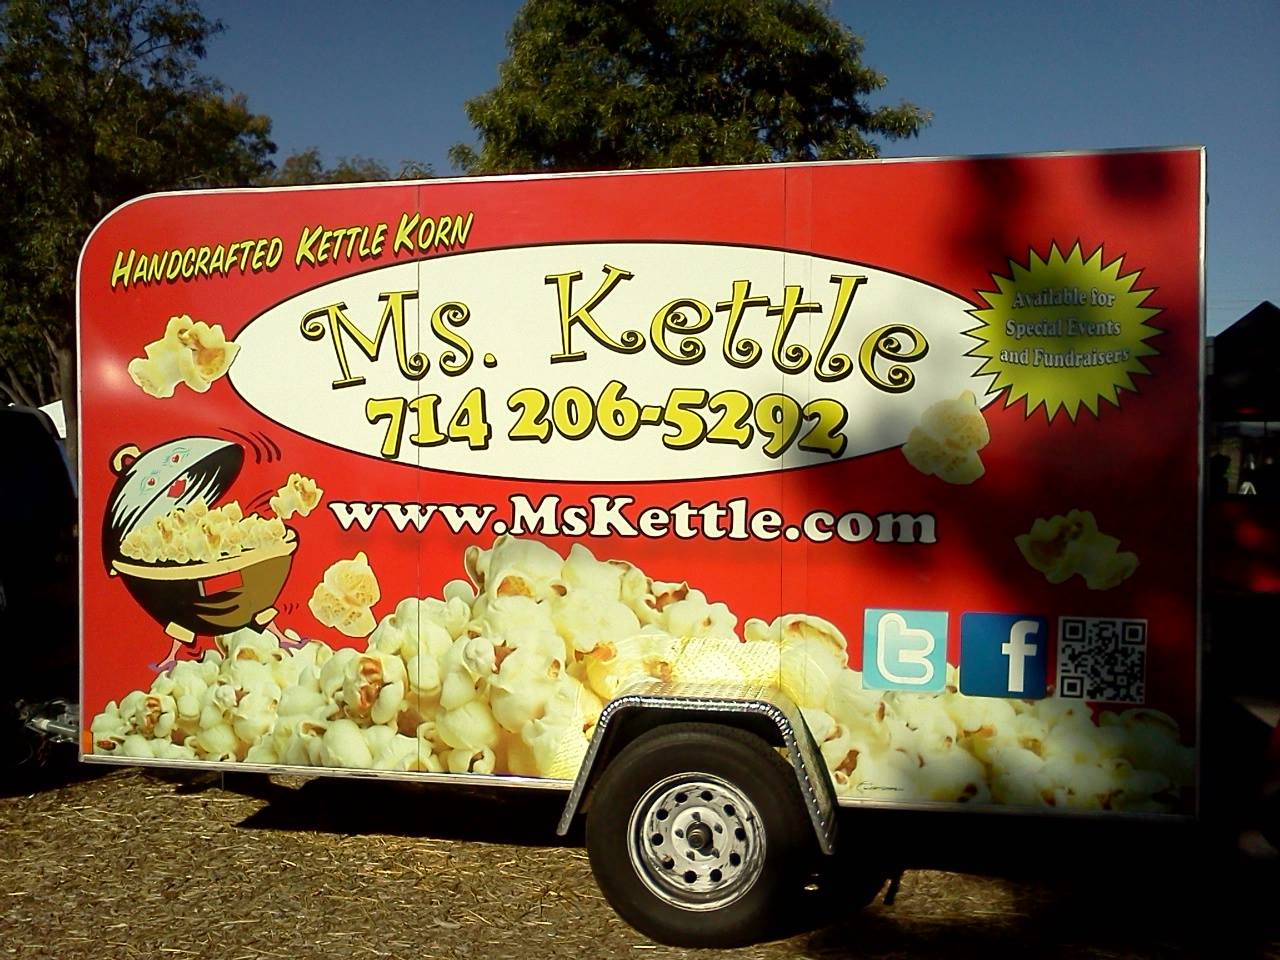 Ms Kettle Gourmet Kettle Korn - Serving Kettle Korn